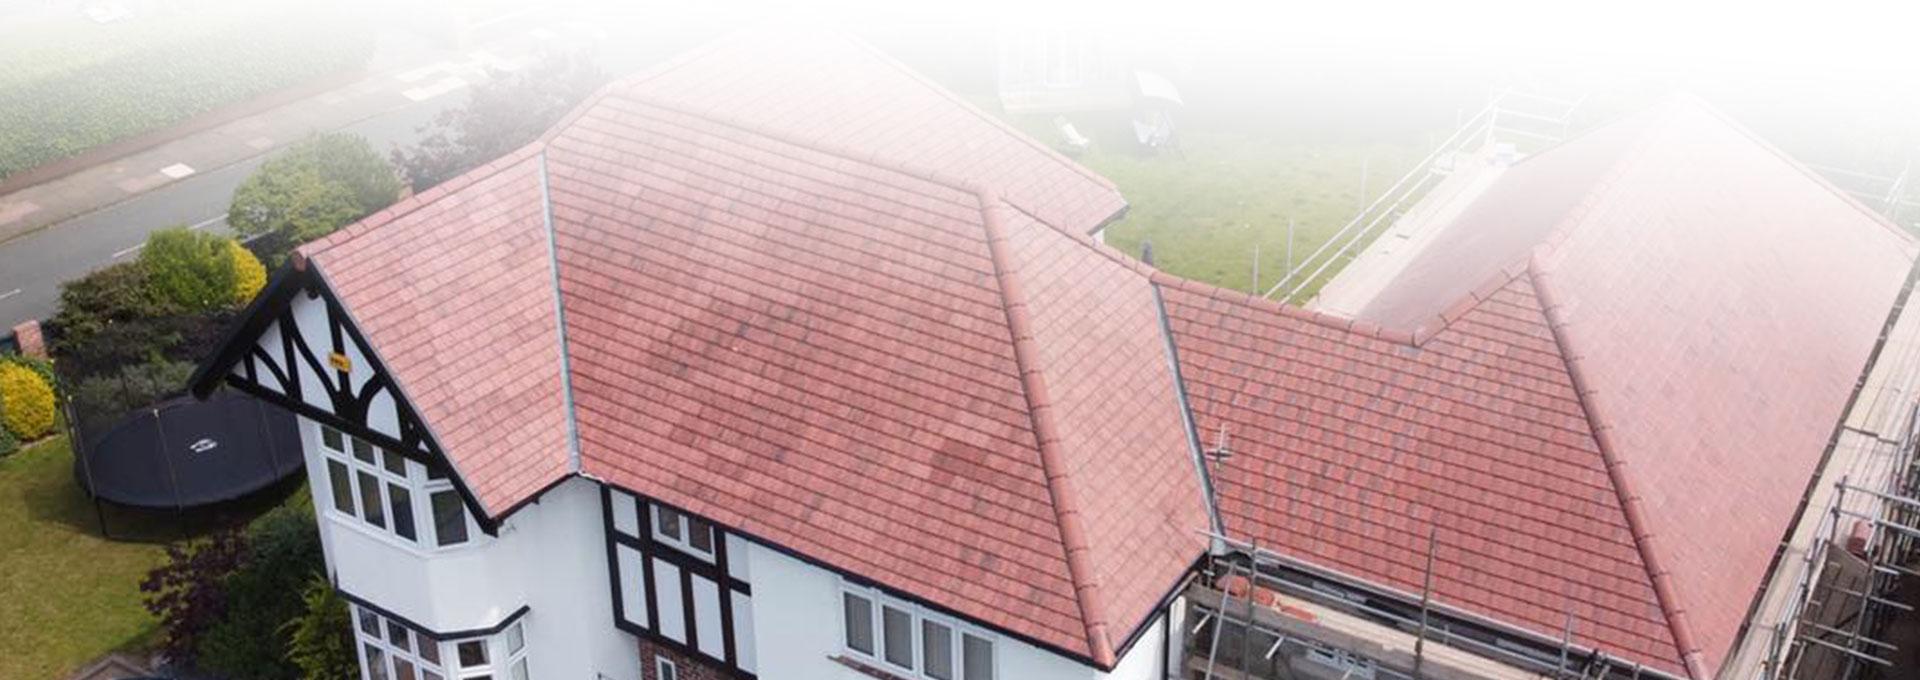 Tiled Roof Halsall